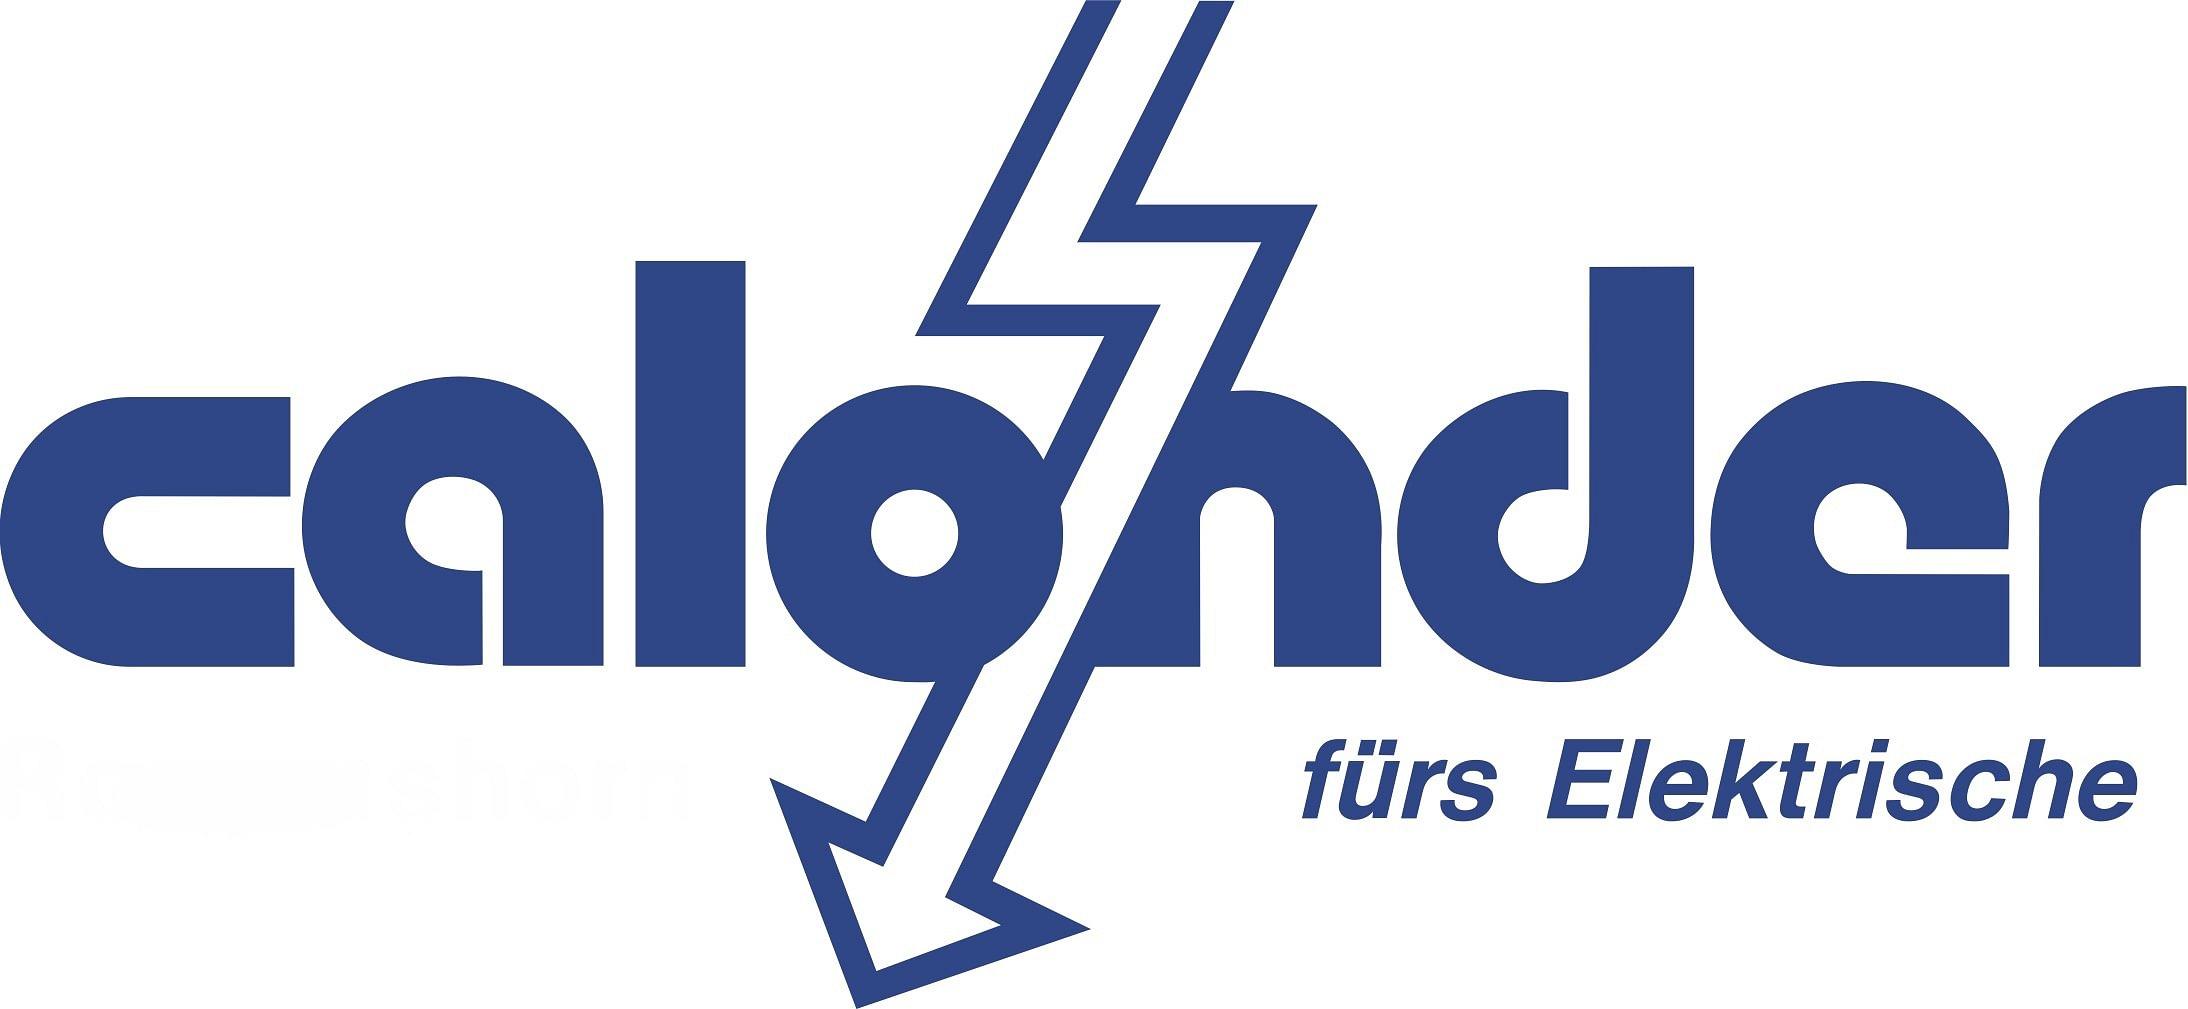 Calonder AG